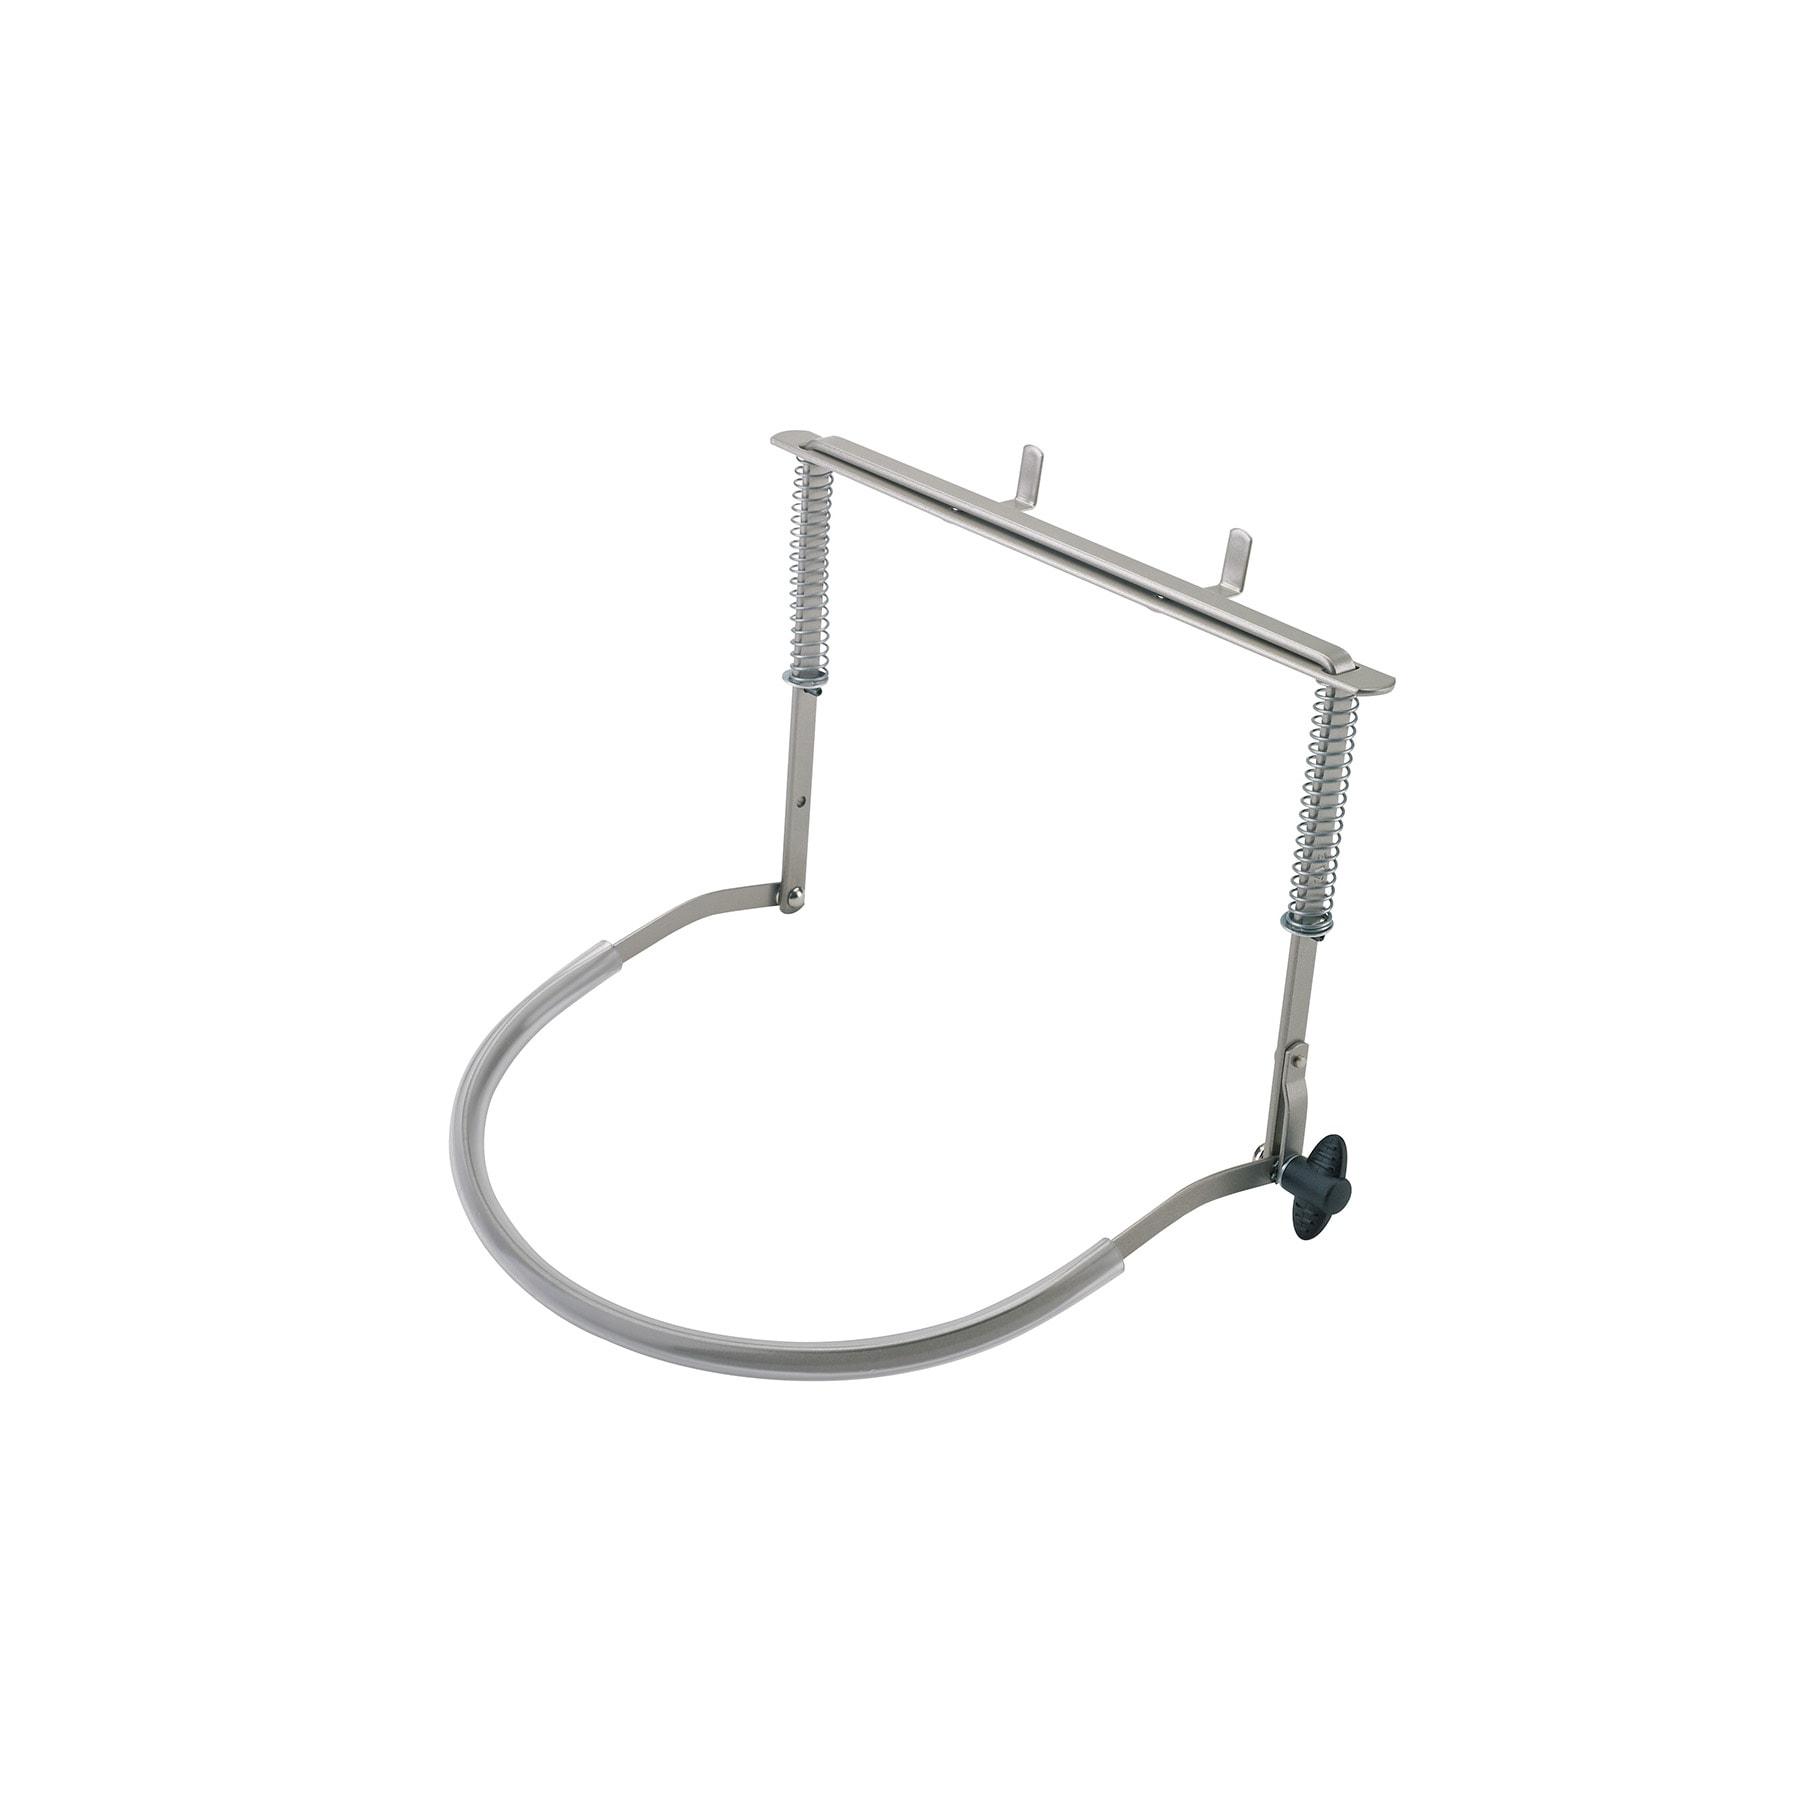 KM16410 - Harmonica holder